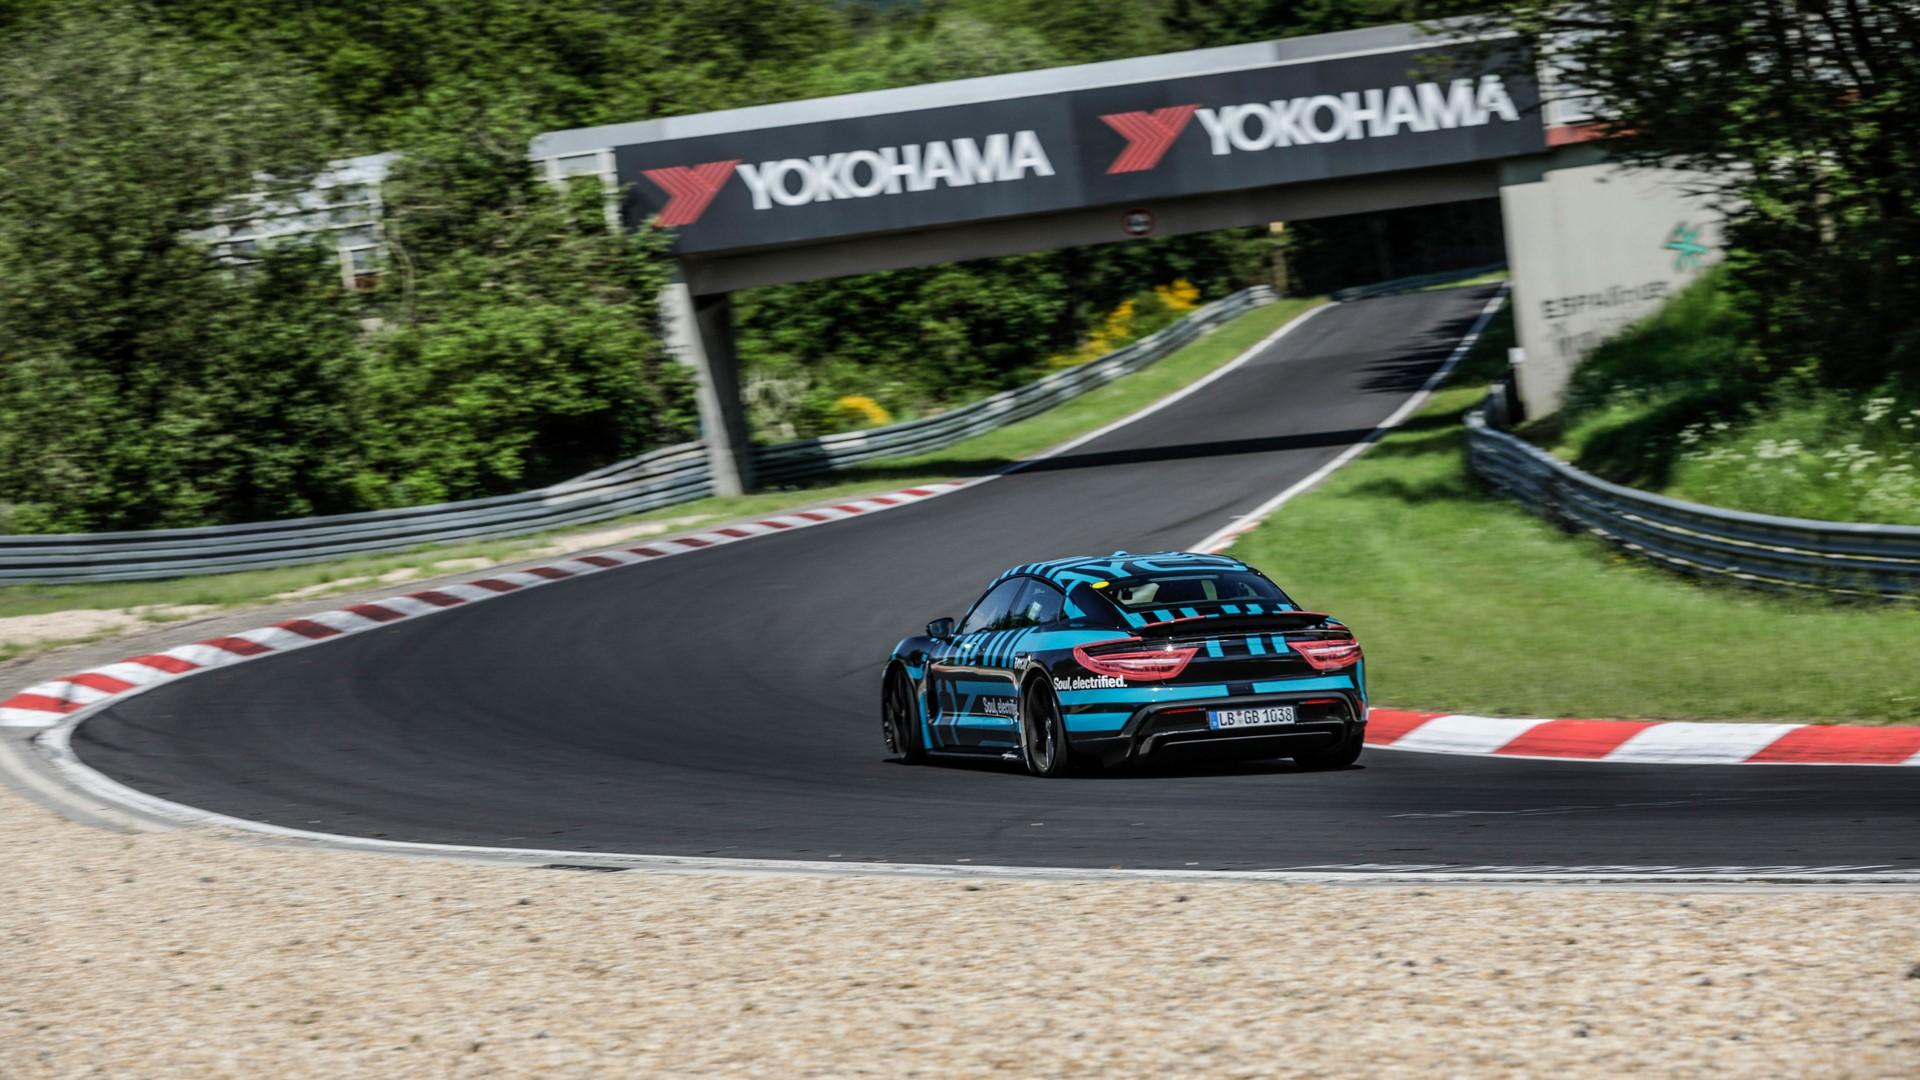 Porsche-Taycan-Nurburgring-record-9